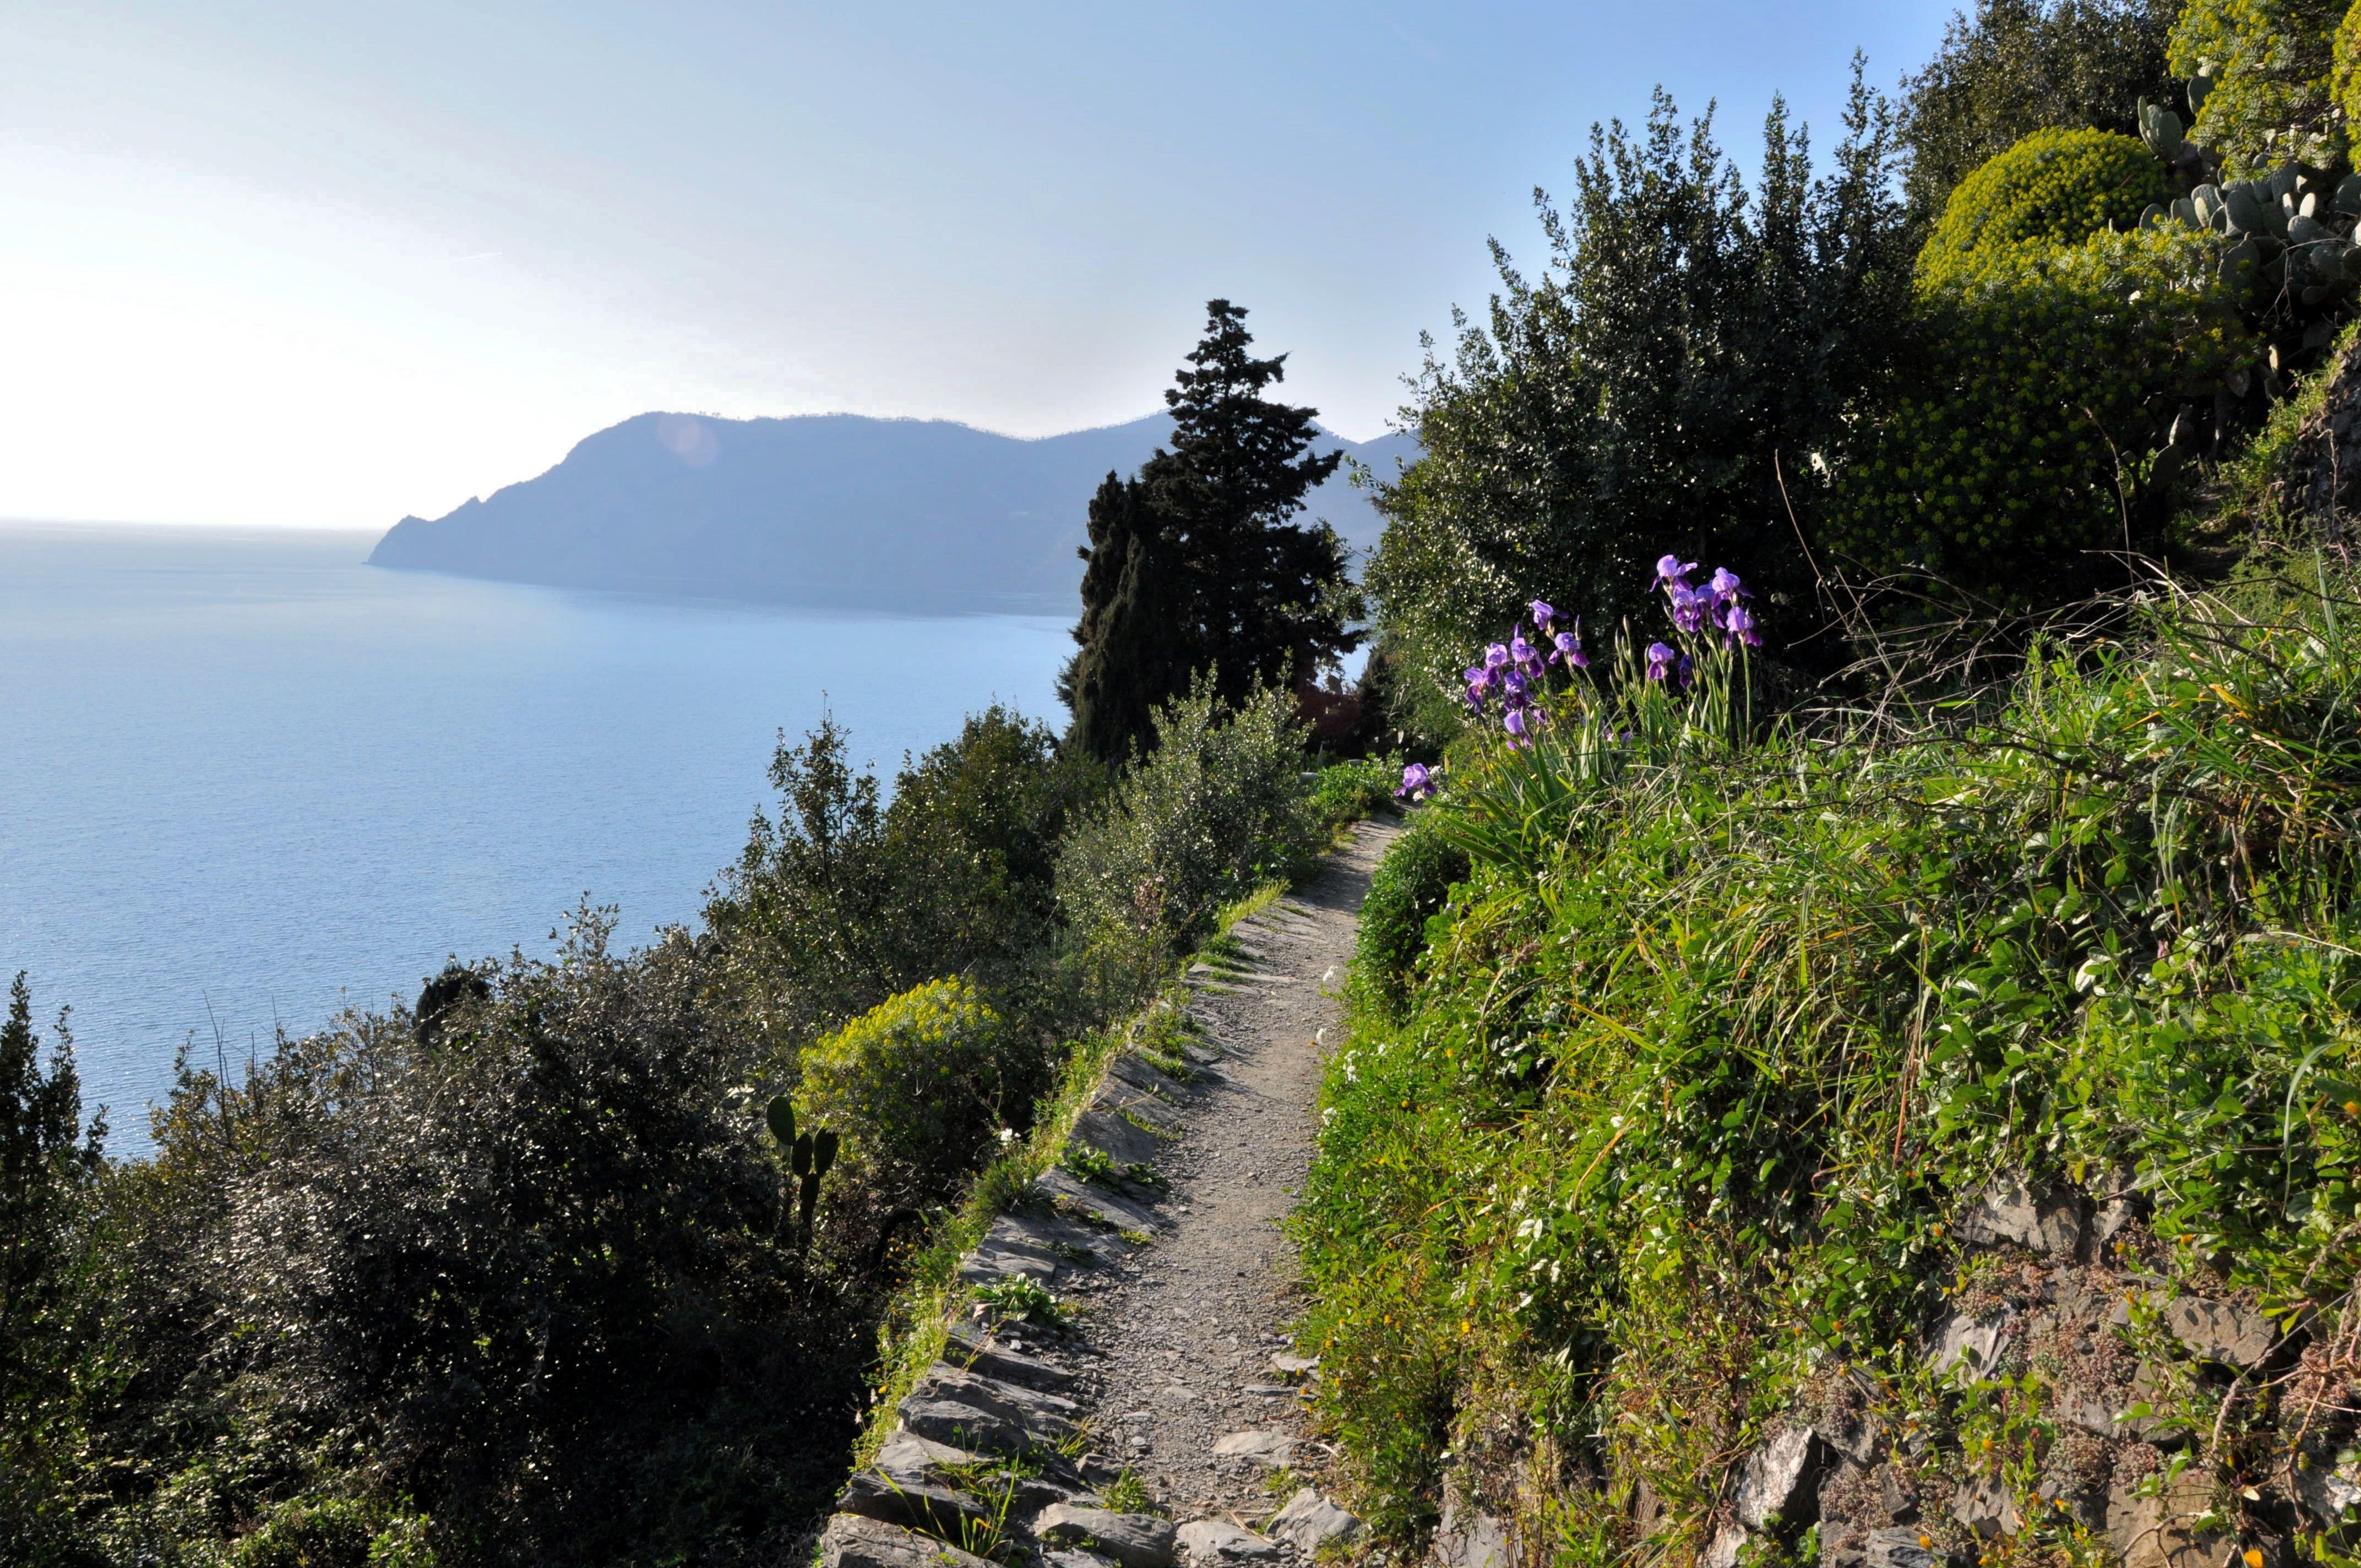 Cinque Terre Trails (Italy)